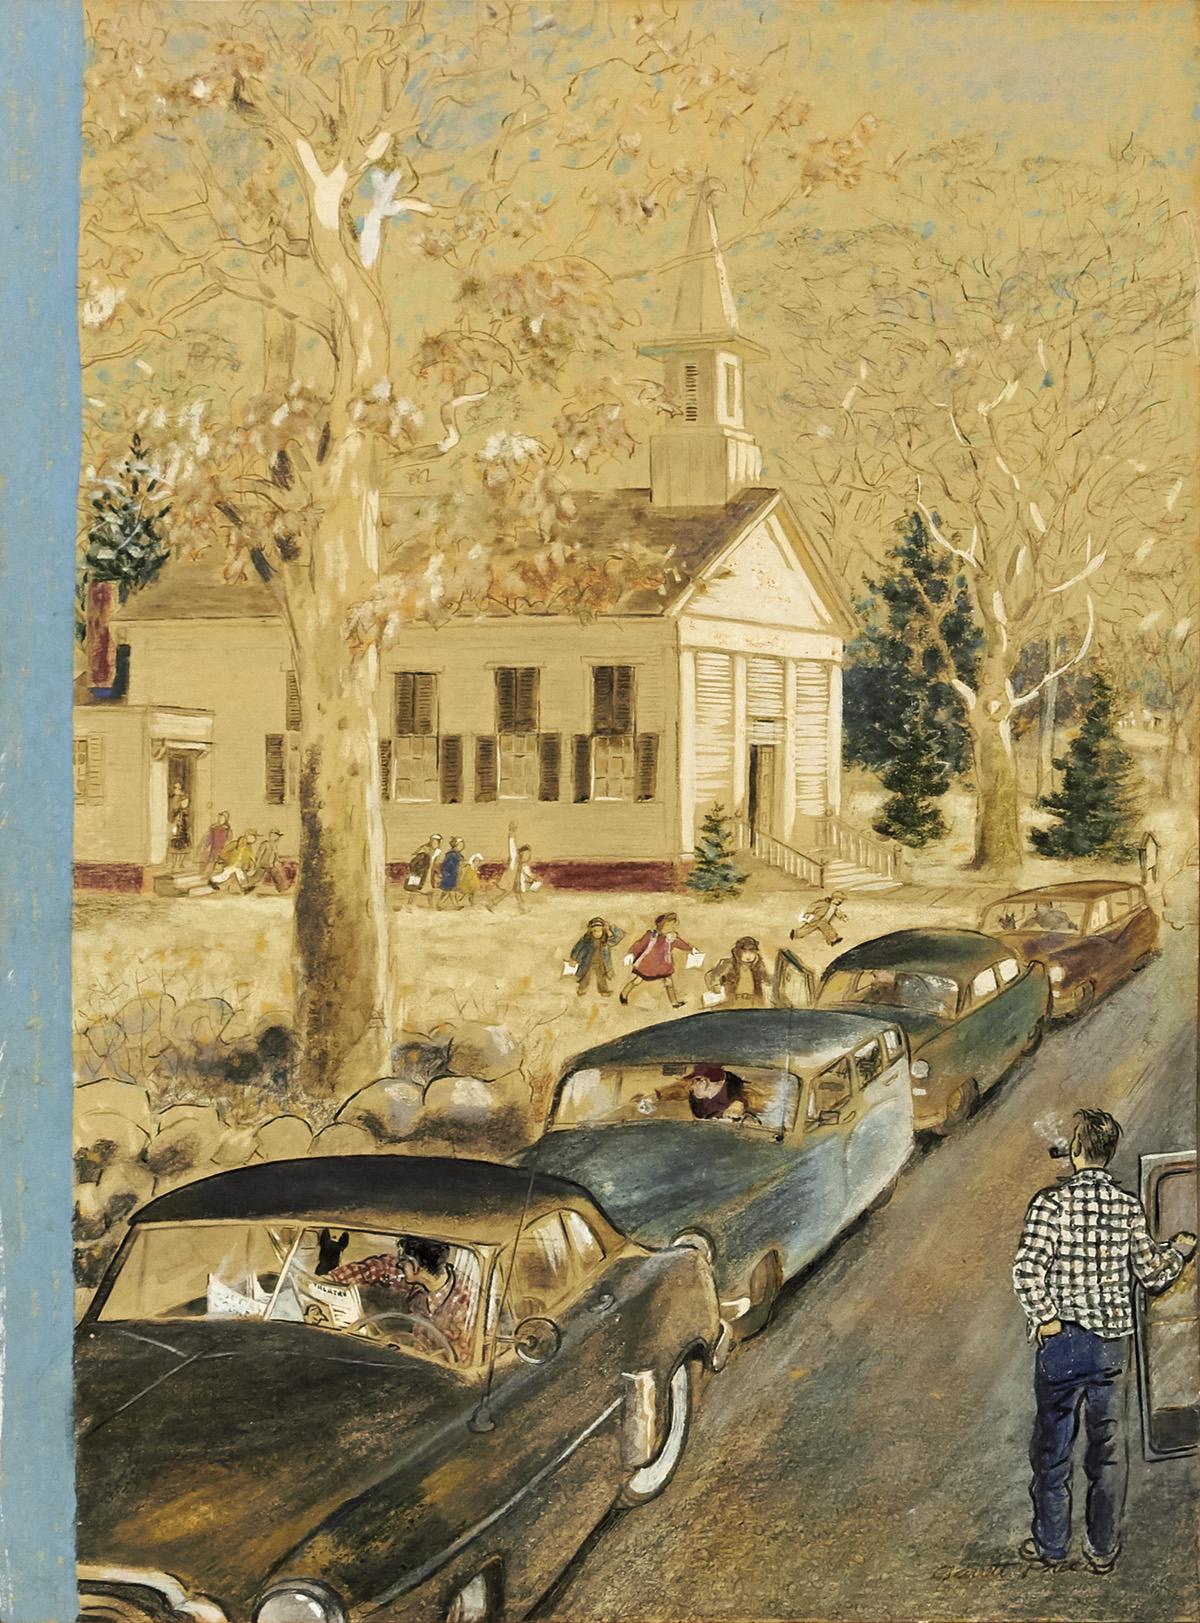 GARRETT PRICE. Emanuel Church, Lyons Plain Road, Weston, Connecticut. [NEW YORKER / COVER ART].